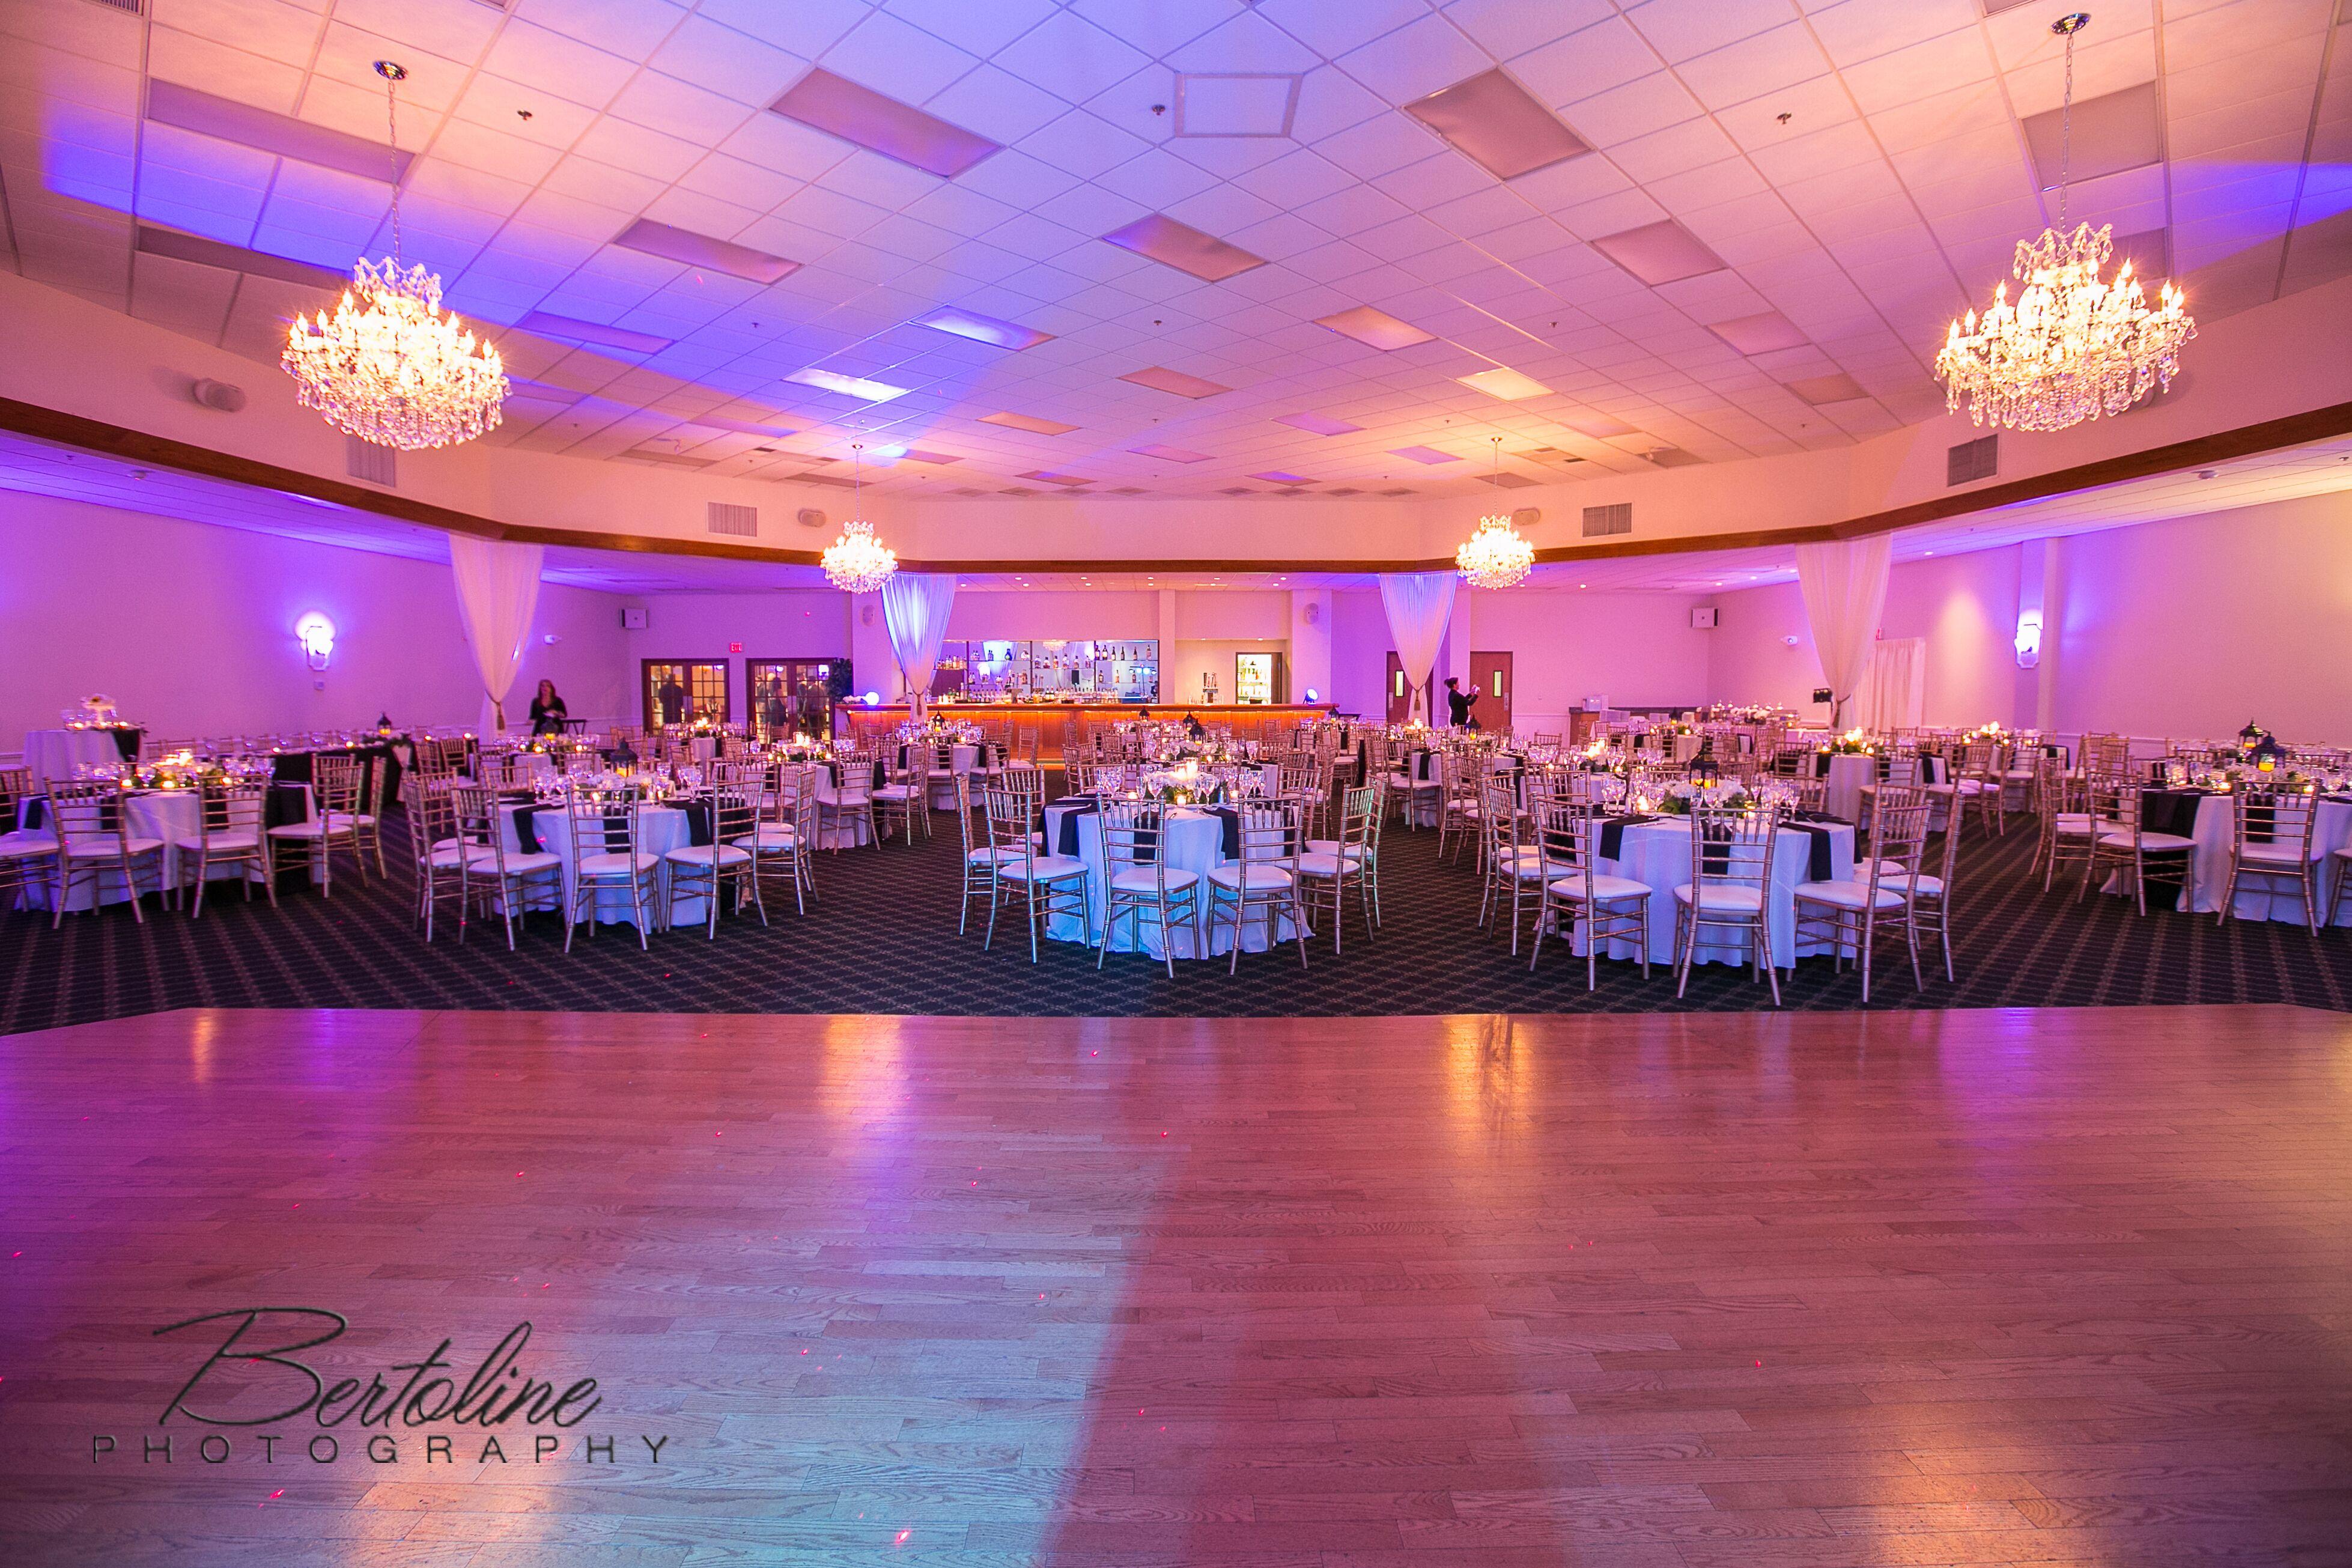 The Emerald Ballroom - Philadelphia, PA